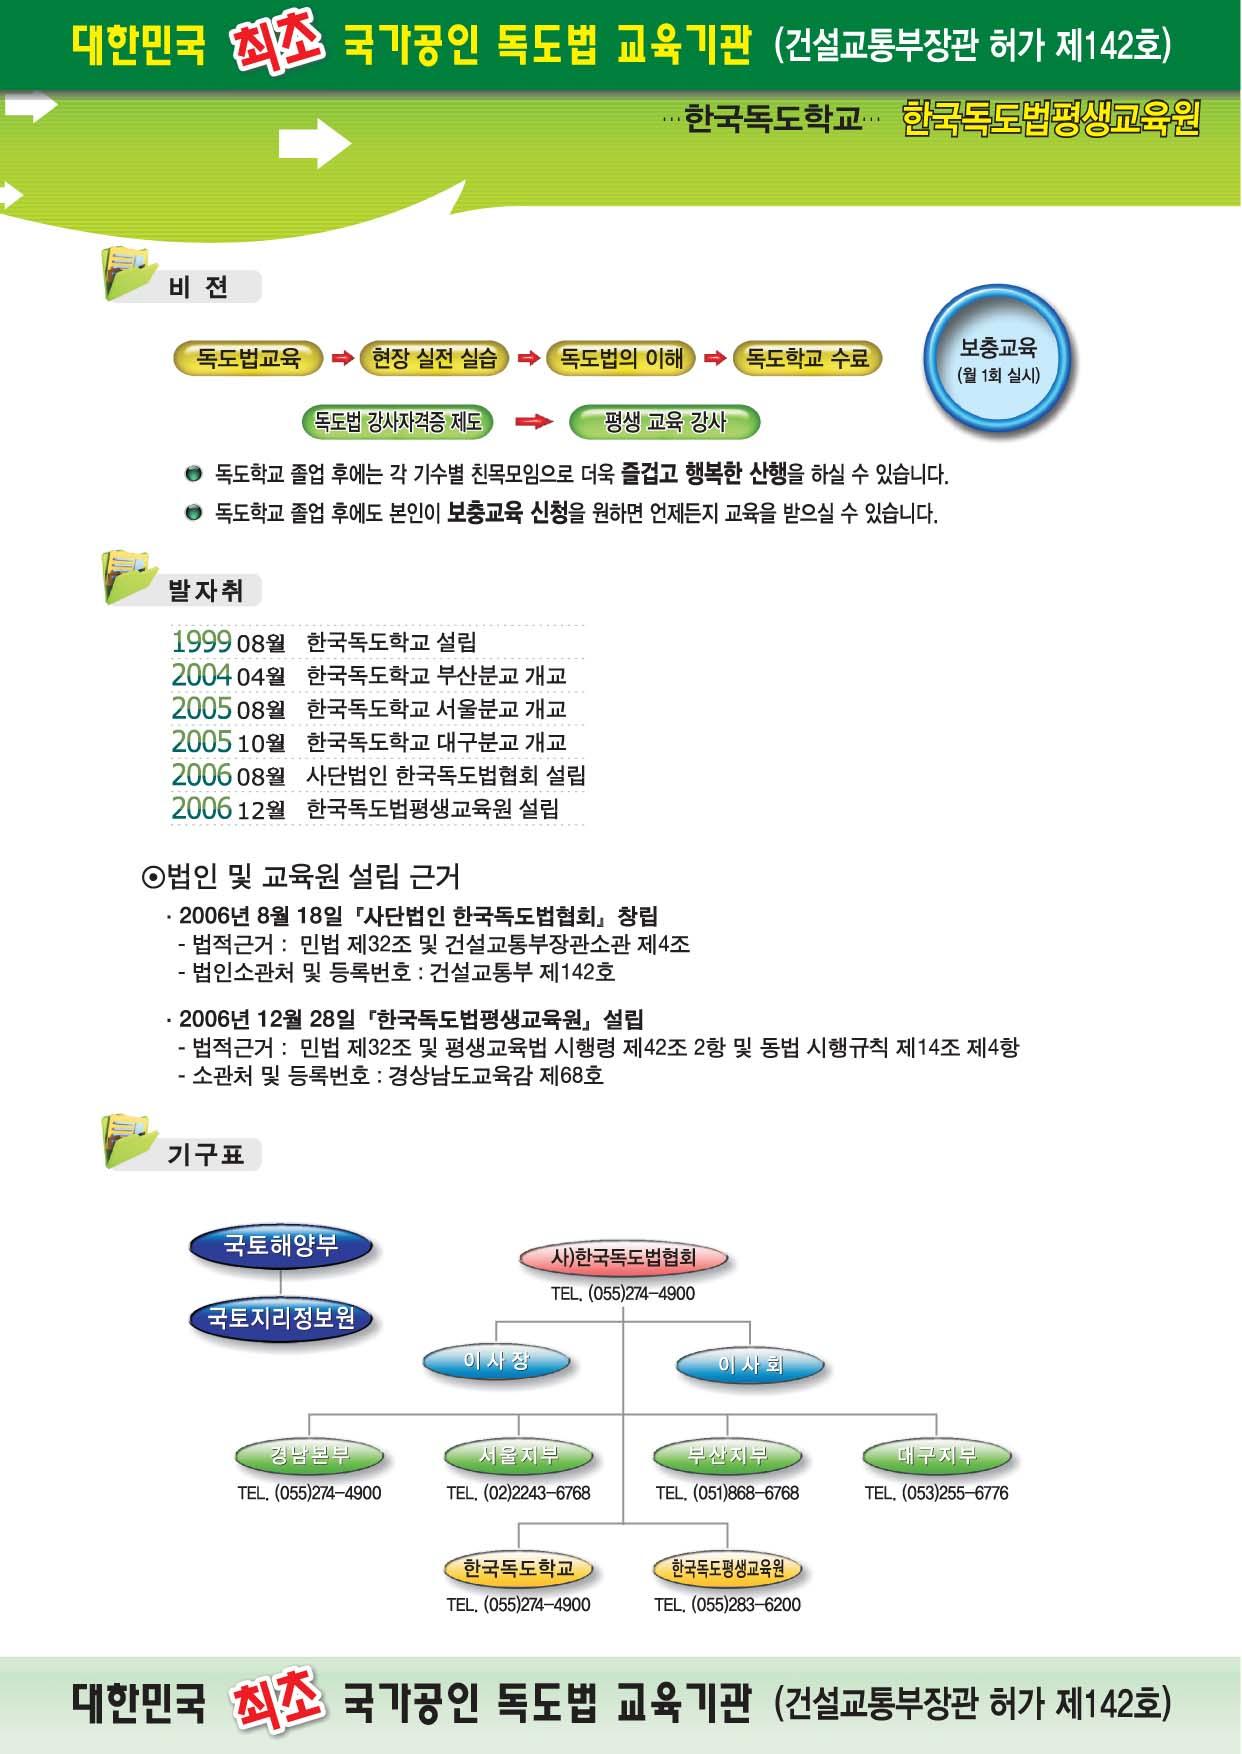 information2-1.jpg